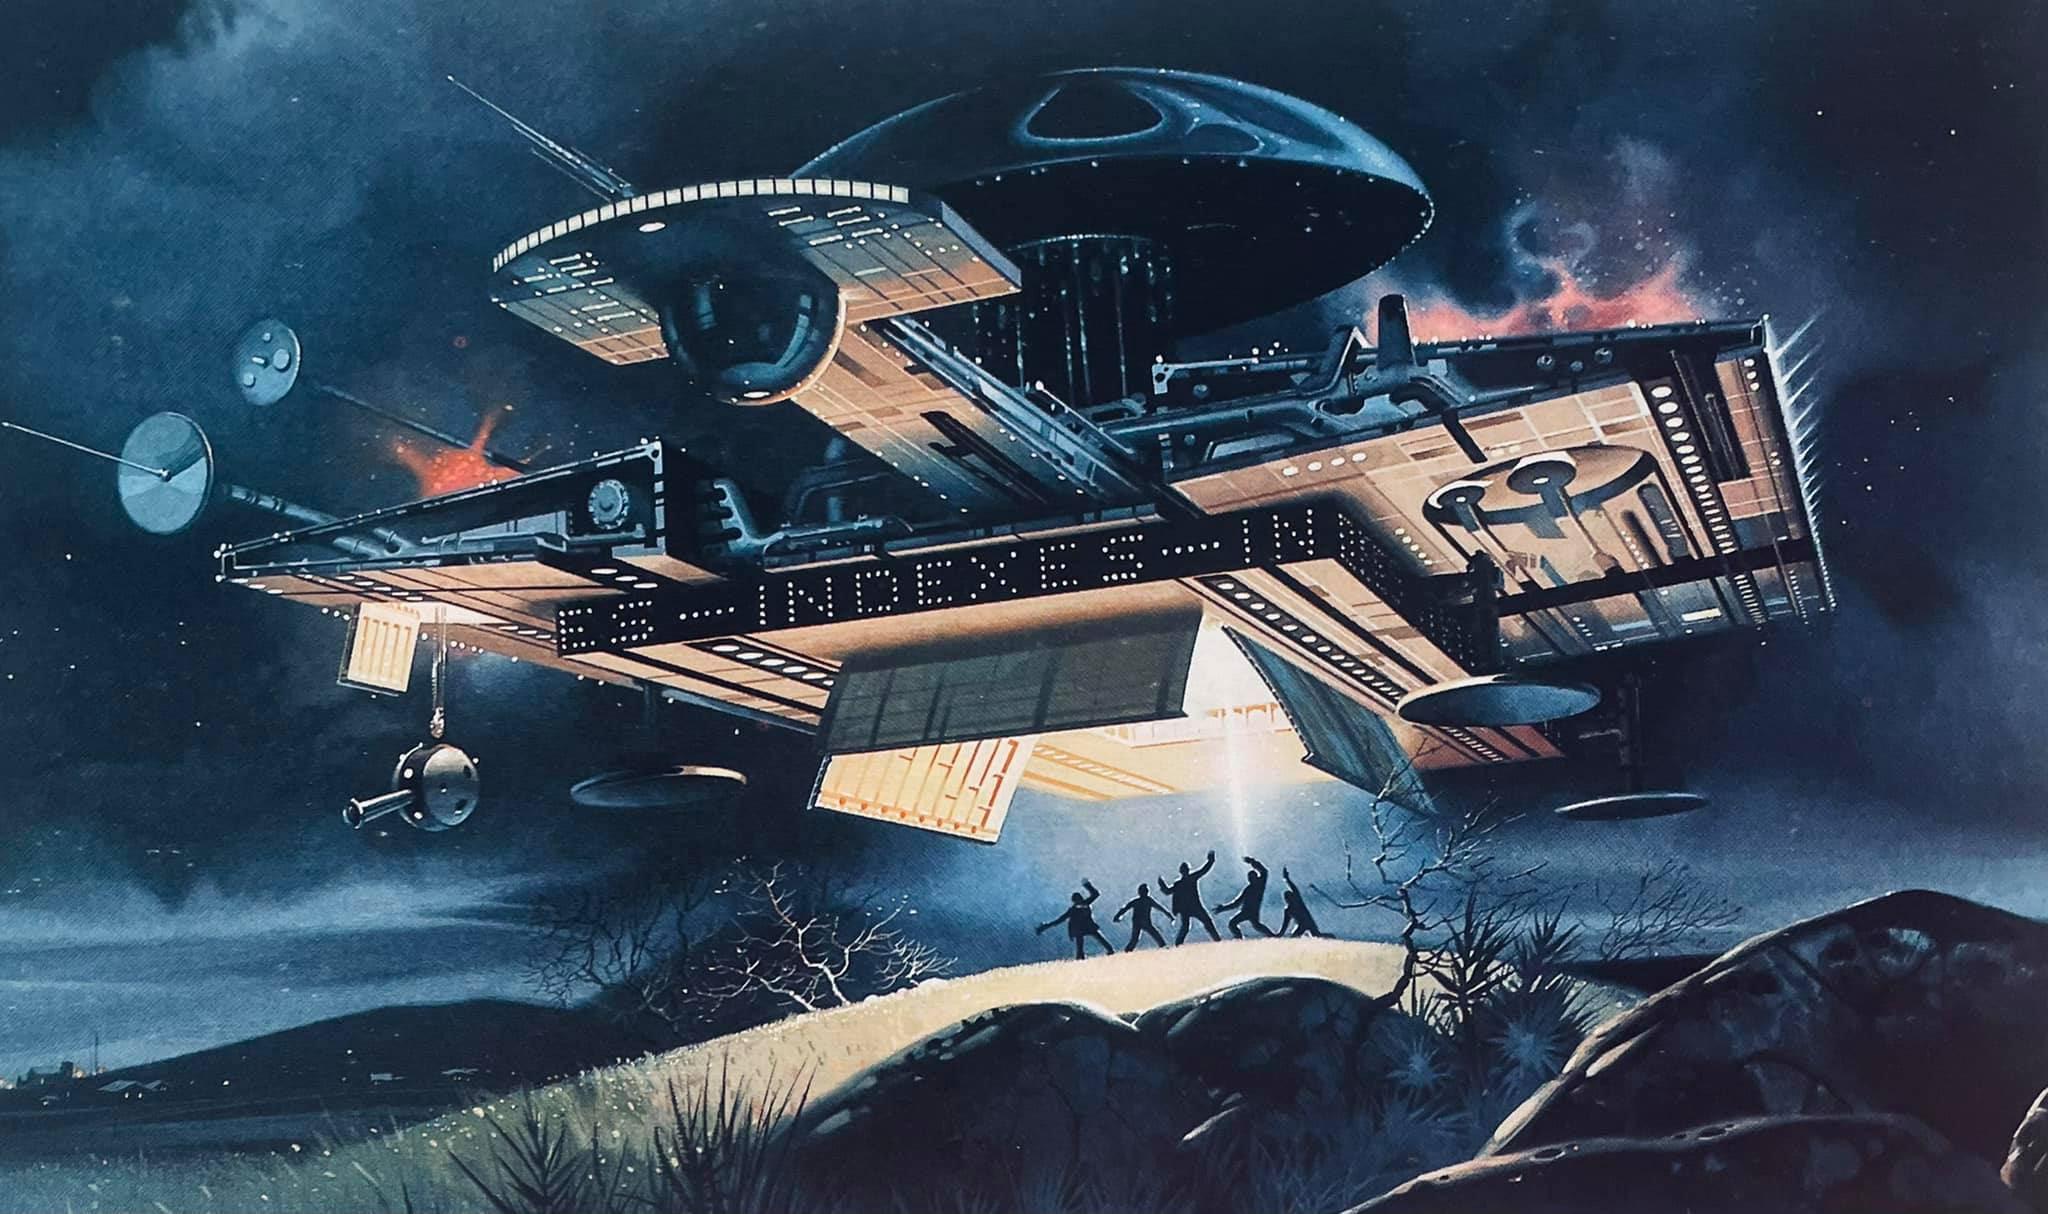 Paul Alexander Scifi Spaceship Indexes